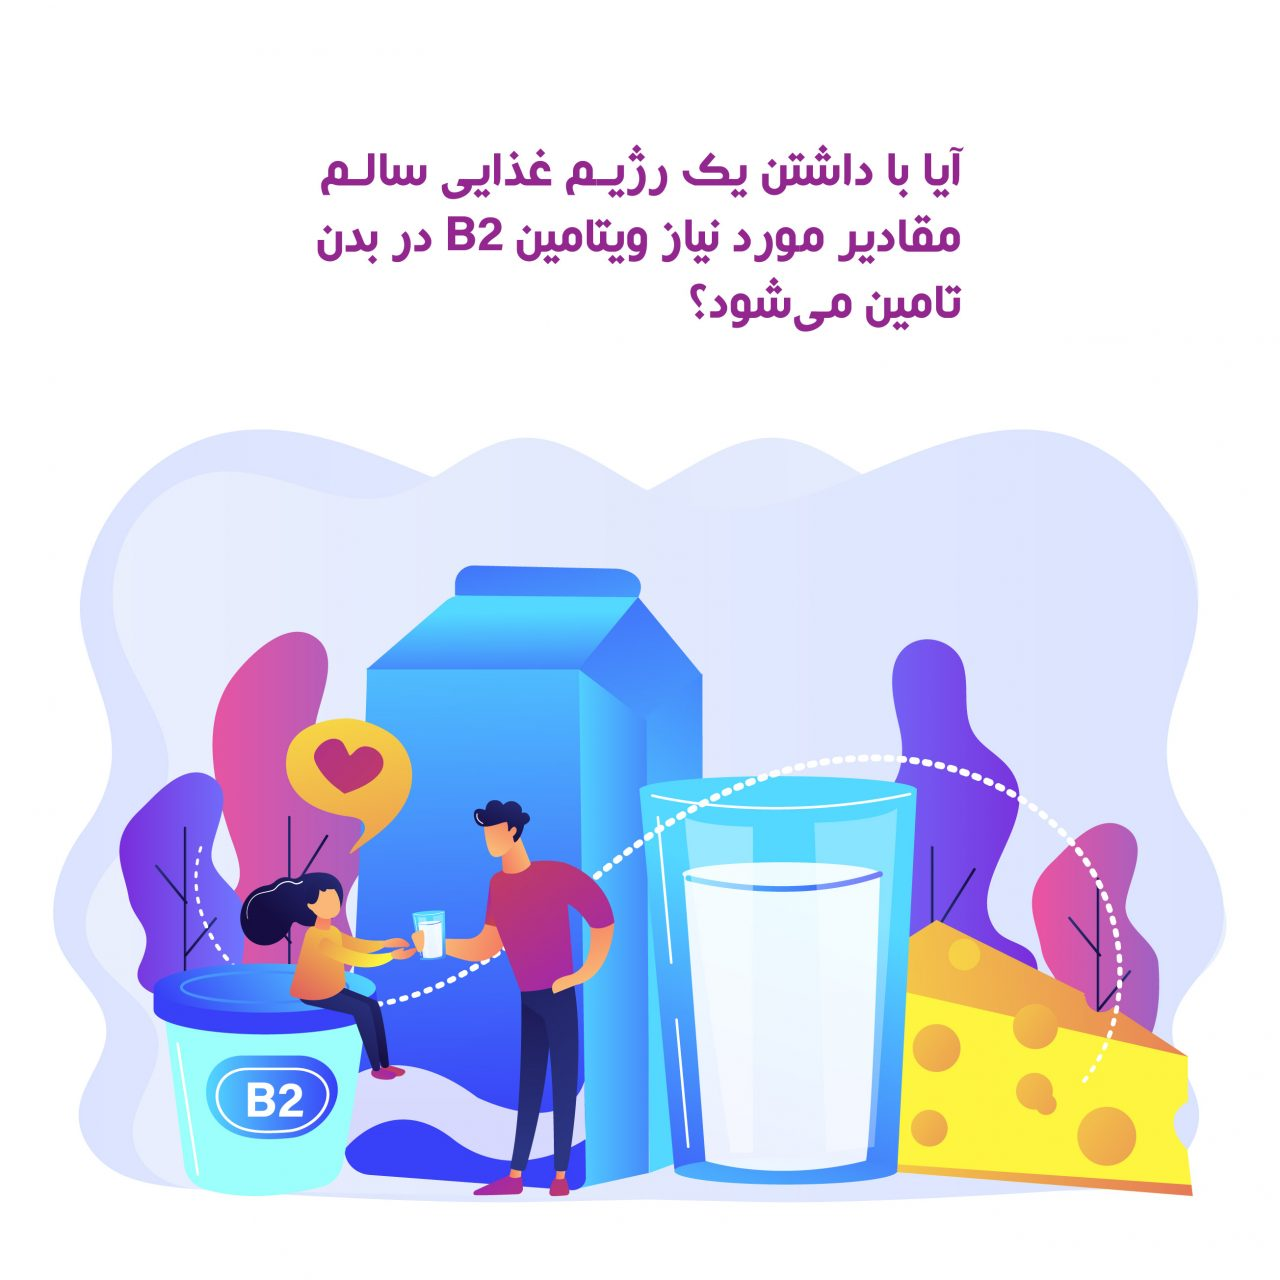 http://hakimanteb.com/wp-content/uploads/2021/01/aya_ba_dashtan_yek_rezhim_ghazaei_salem_maghadir_morede_niaz_b2-1280x1280.jpg